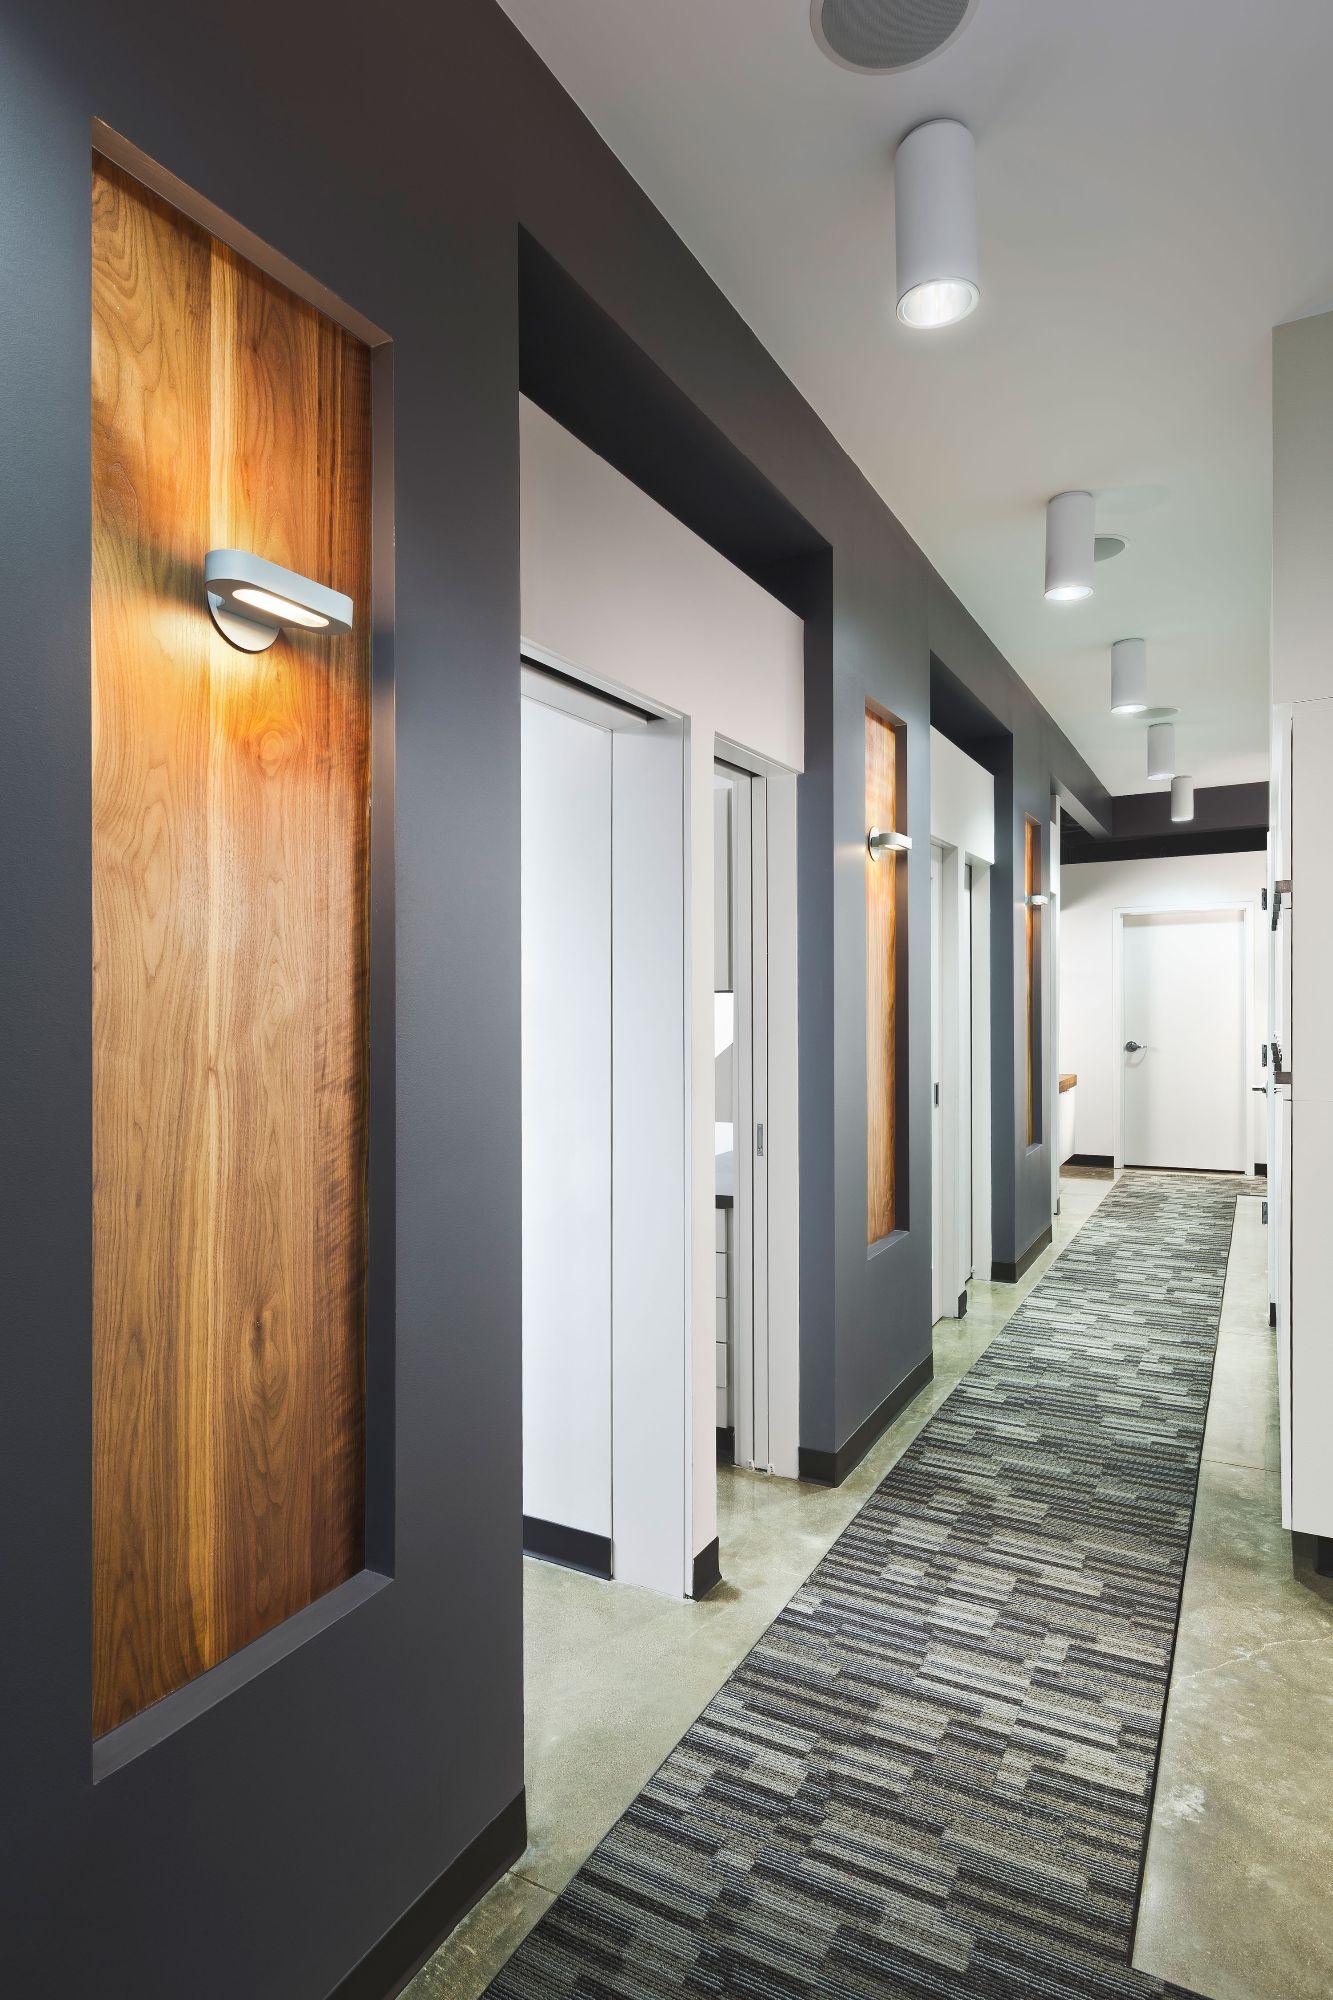 Corson dentistry joearchitect for Office hallway design